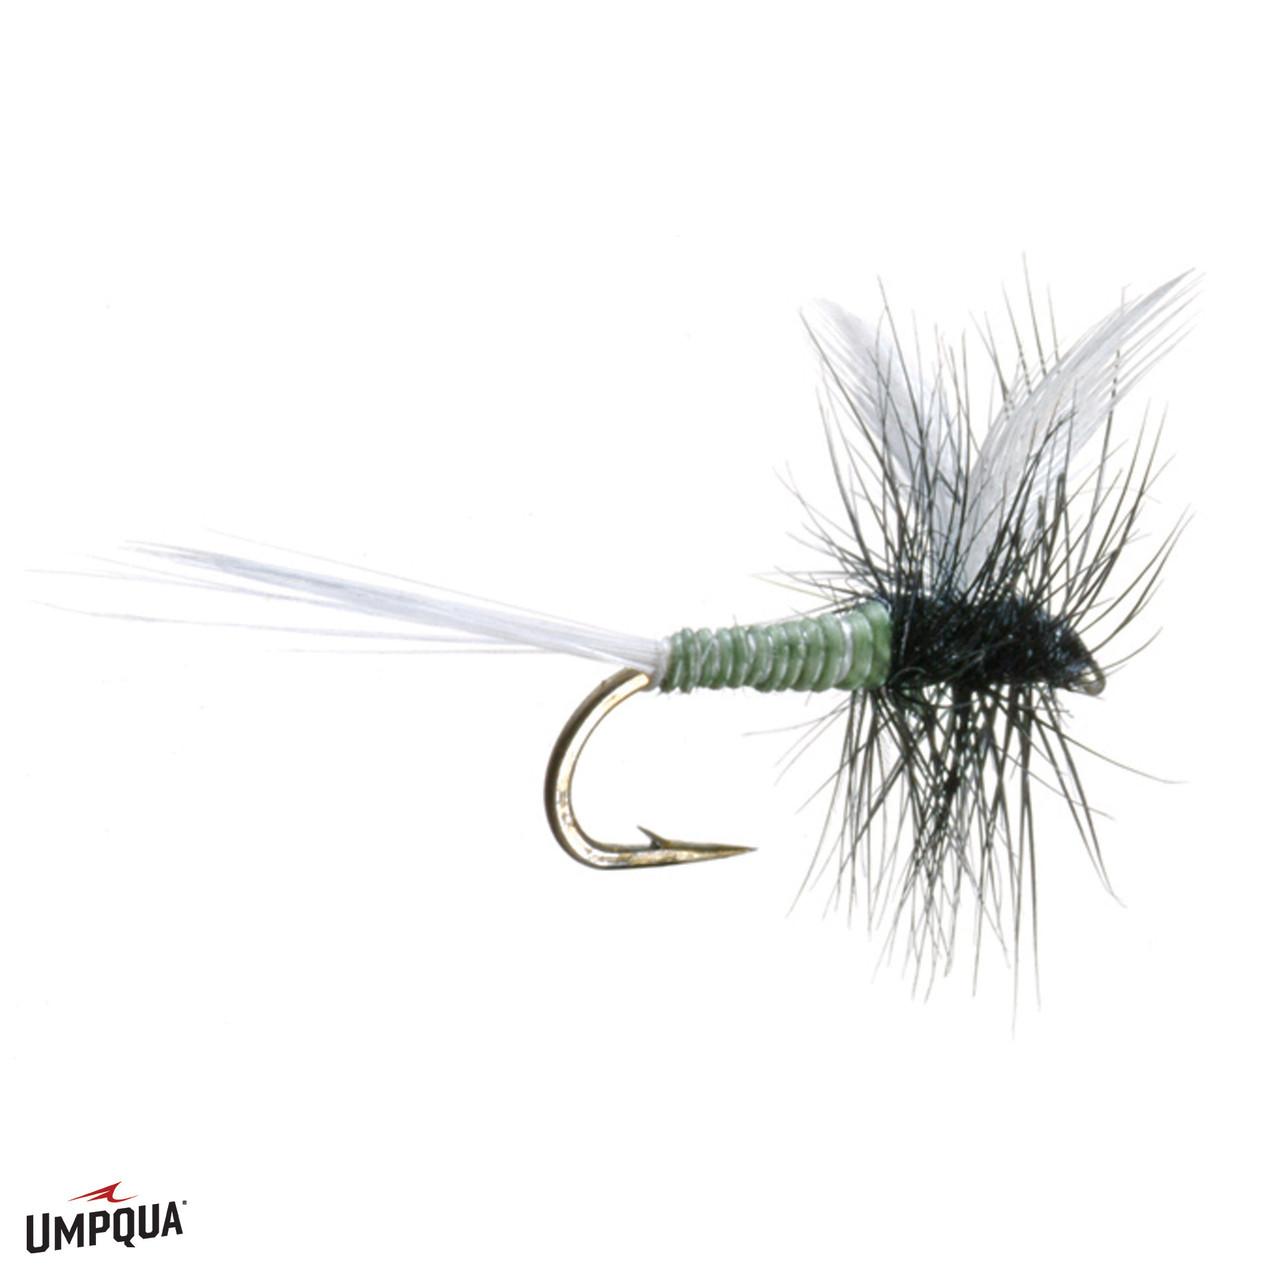 Umpqua Tak/'s Crystal Chironomid Flies